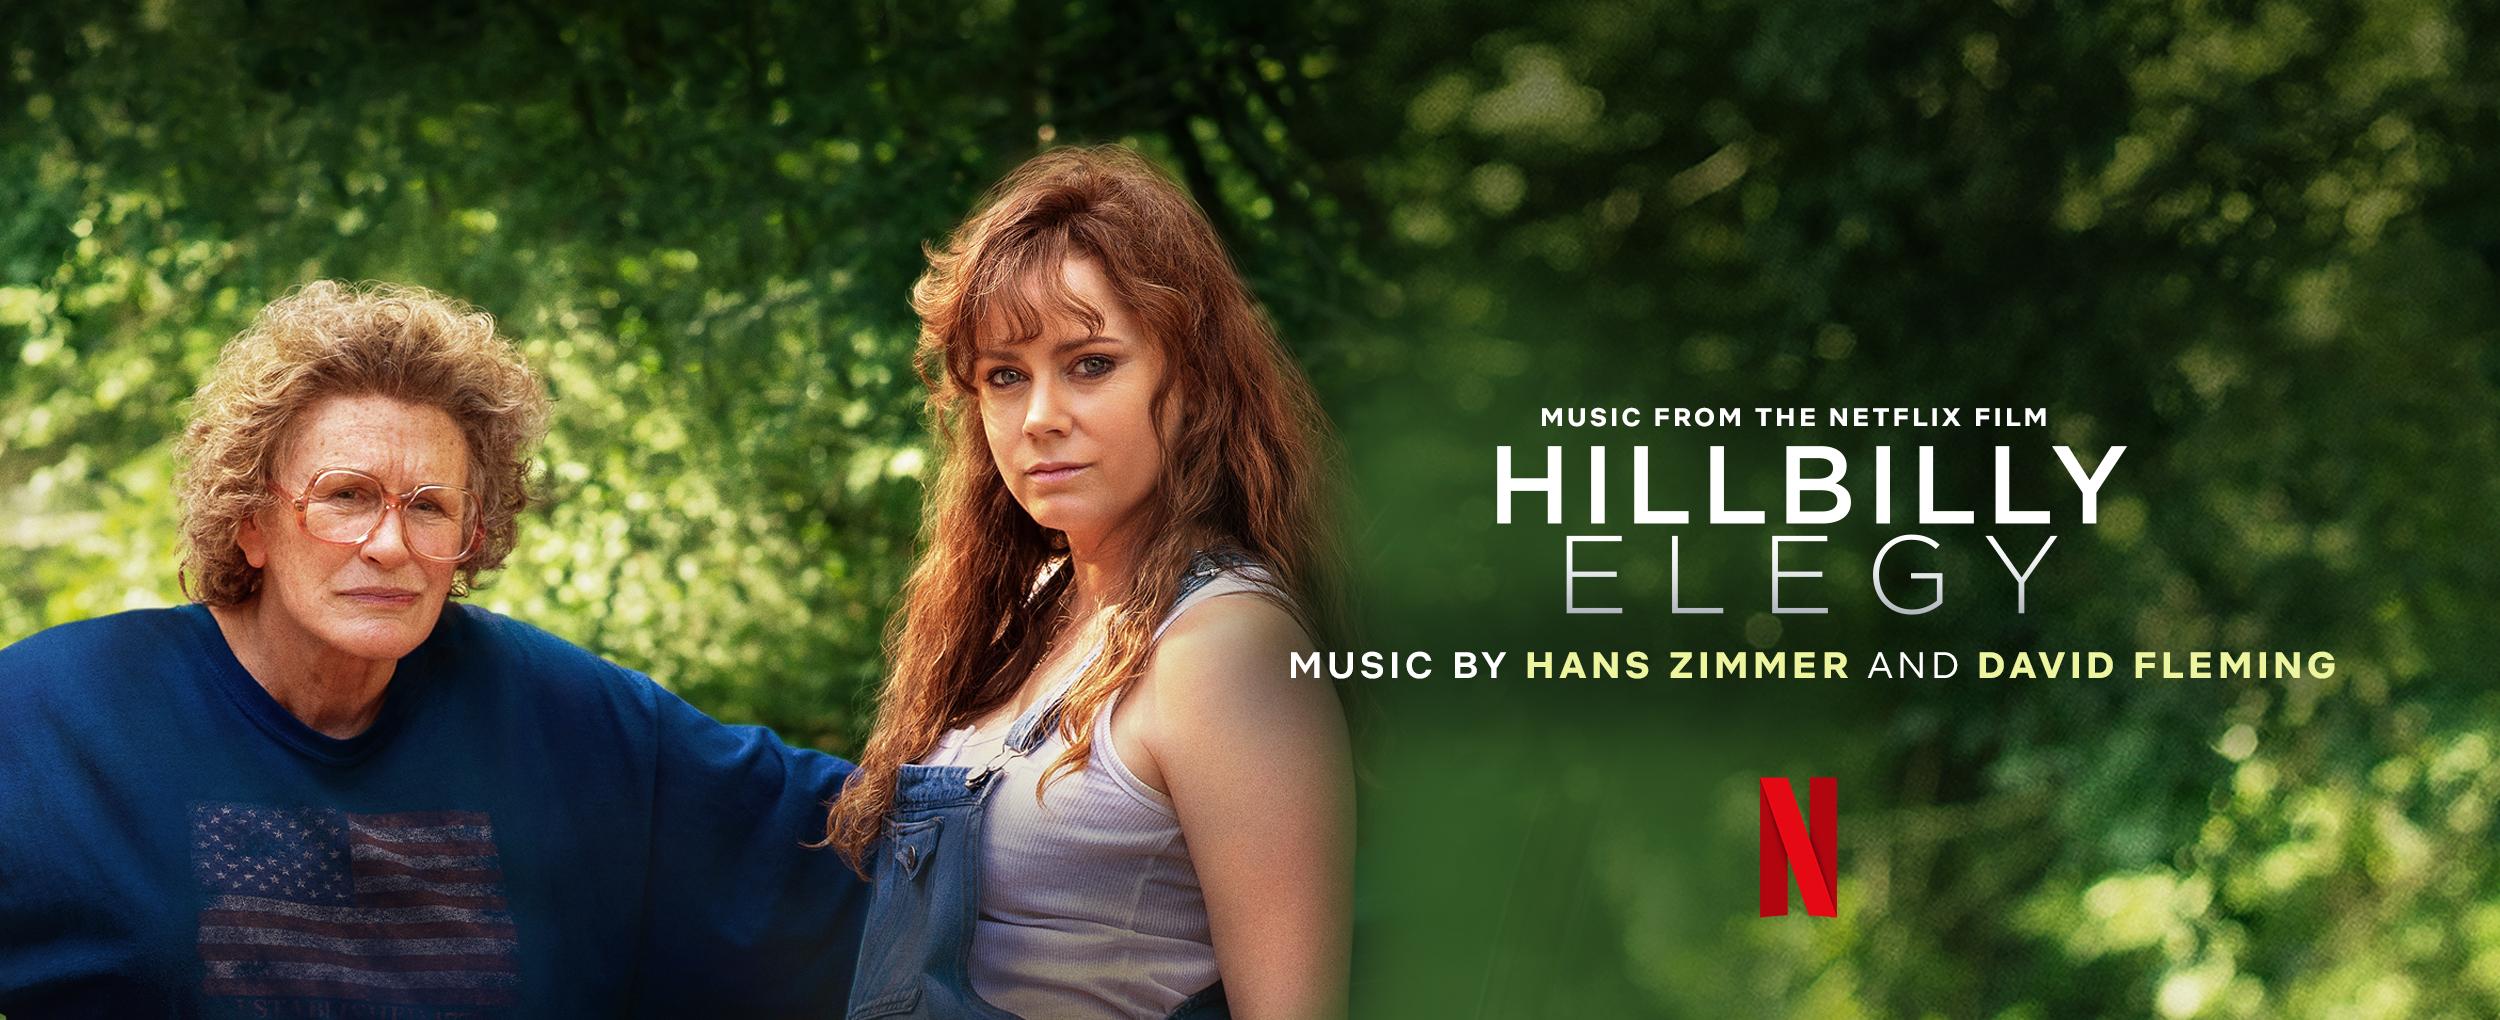 Hillbilly_2500x1200